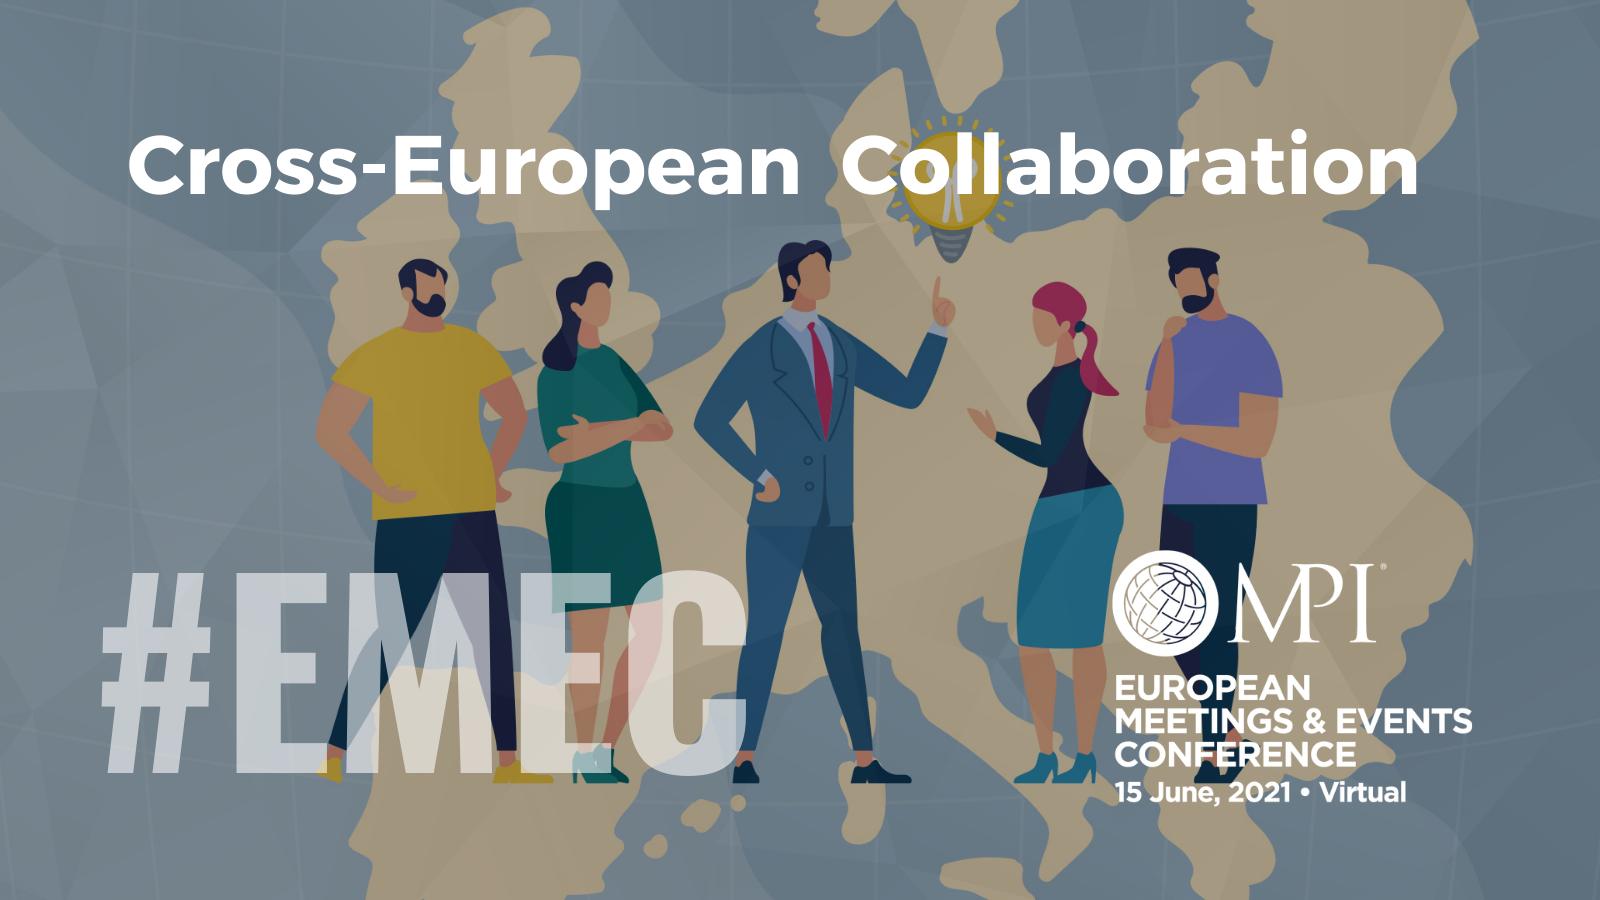 #EMEC Collaboration